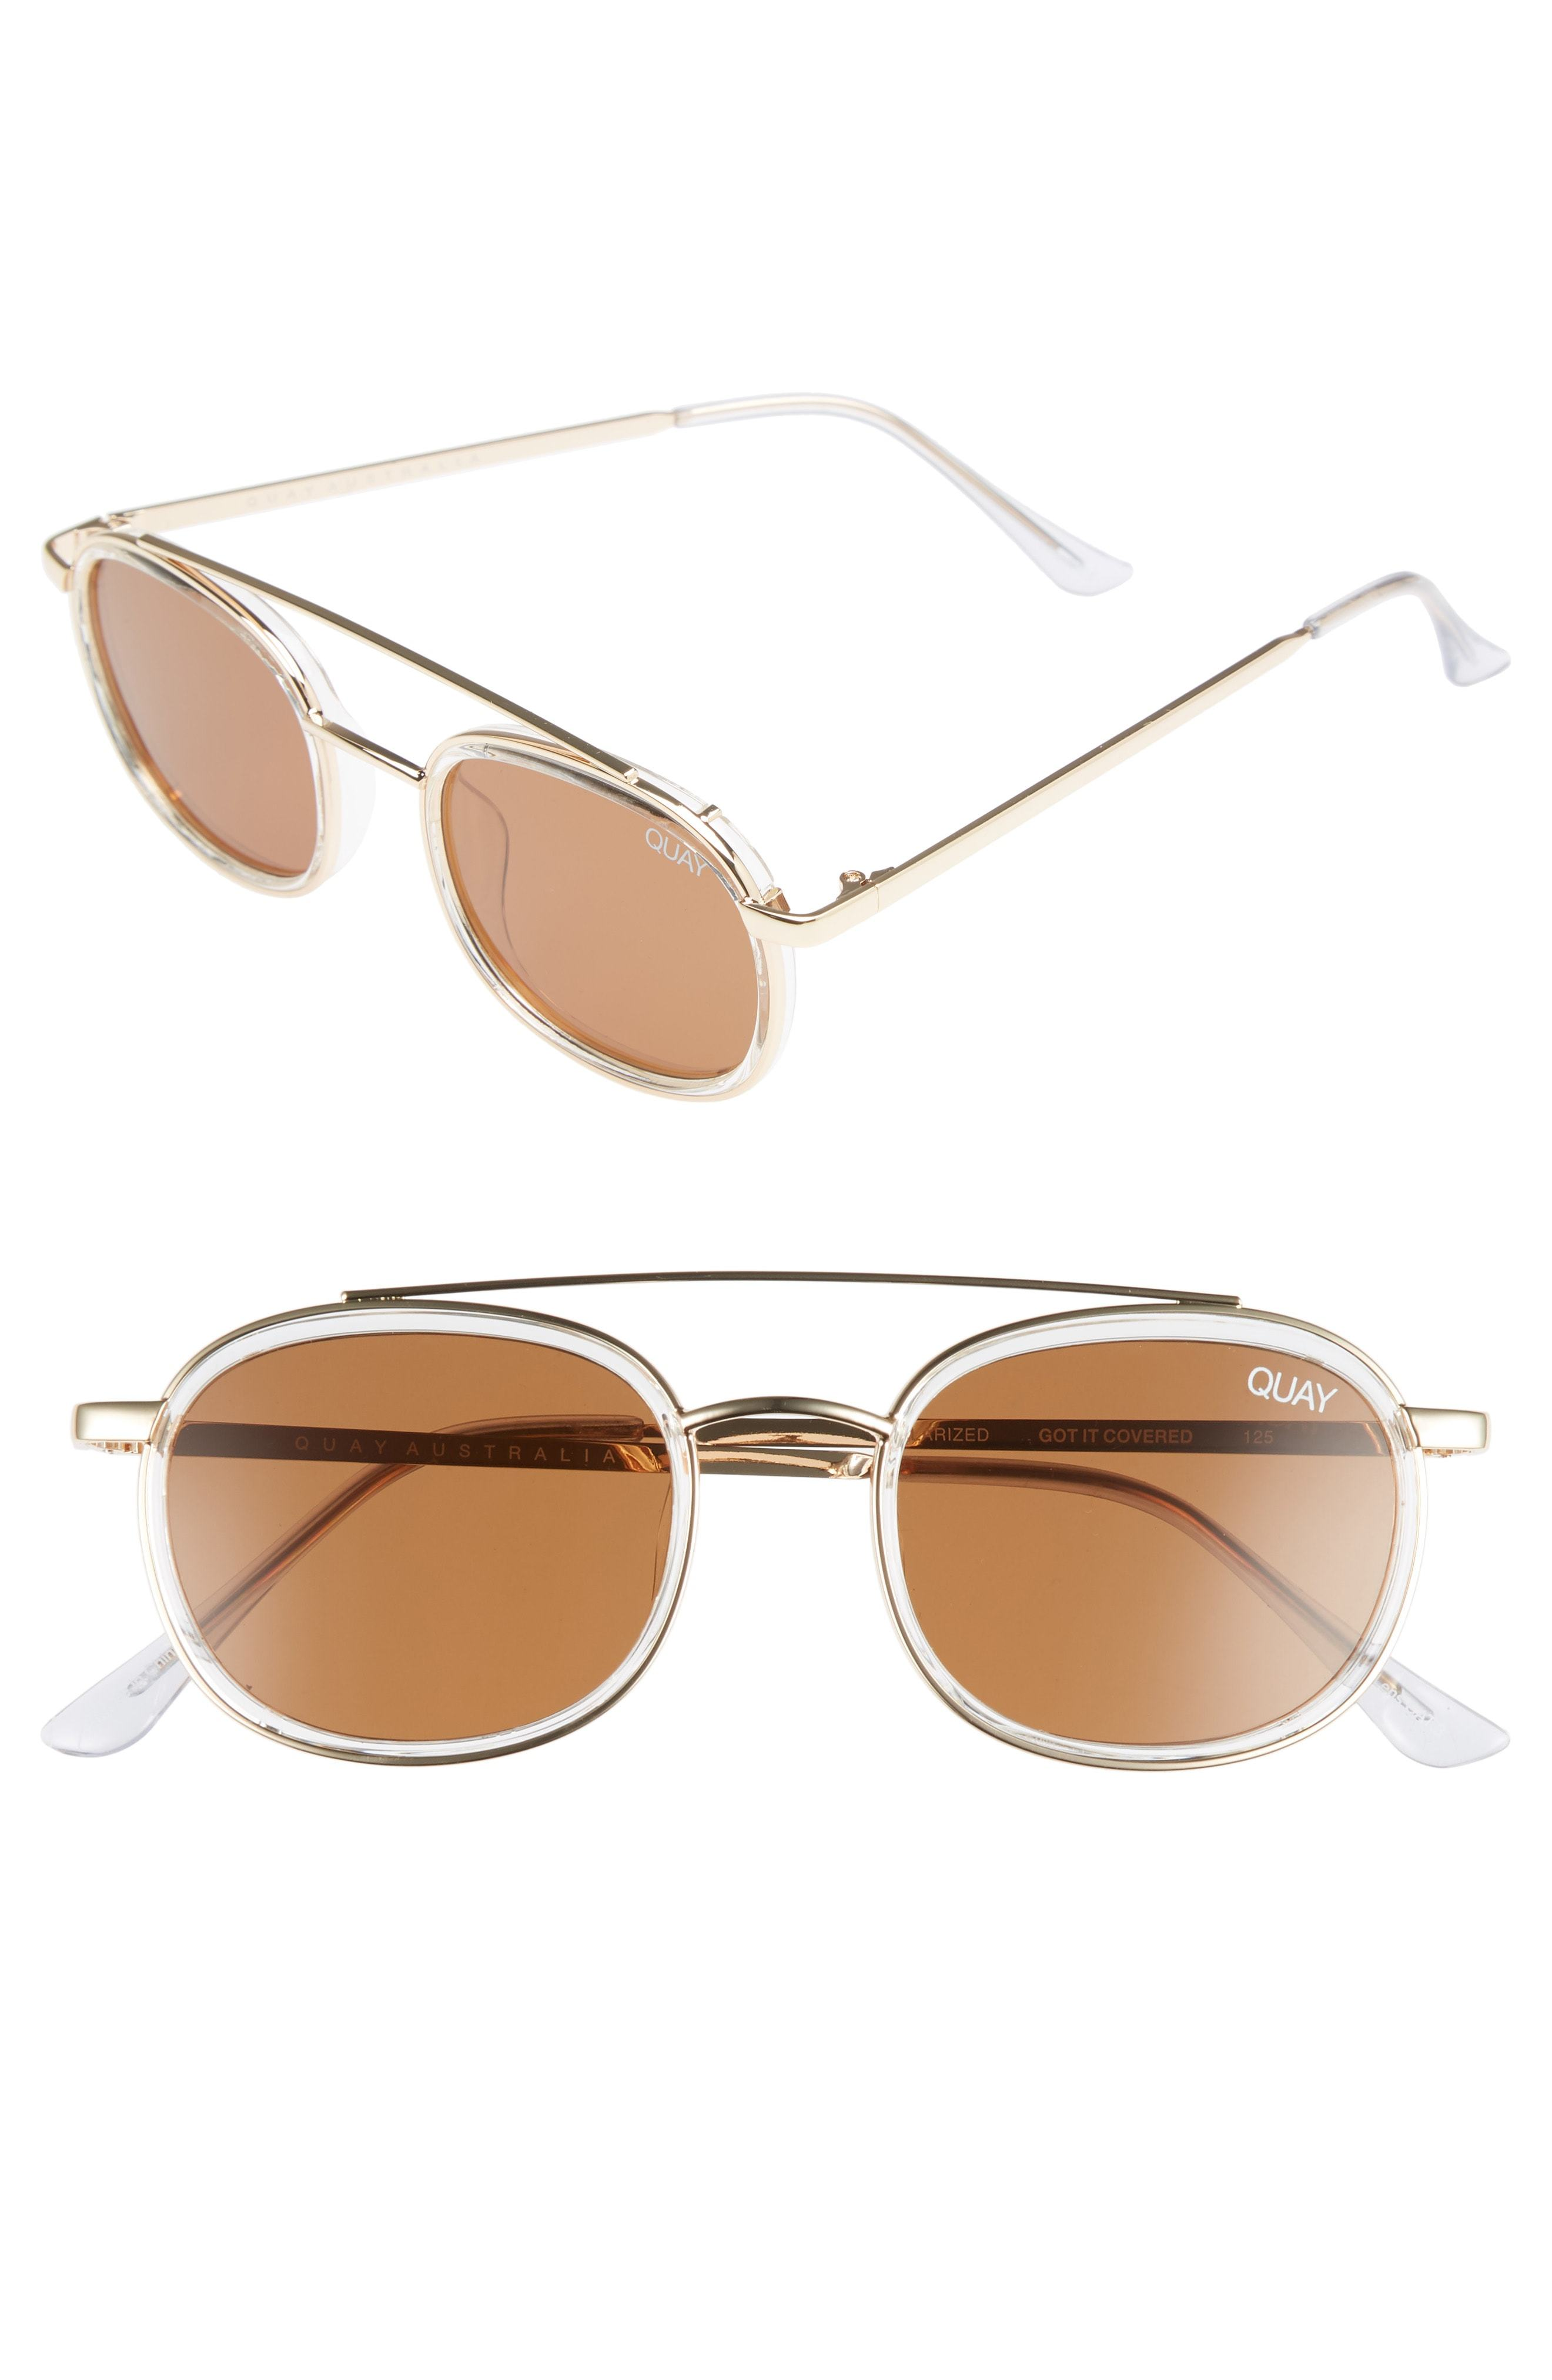 0d1320102e86a ... Quay Australia Got It Covered 50mm Polarized Sunglasses